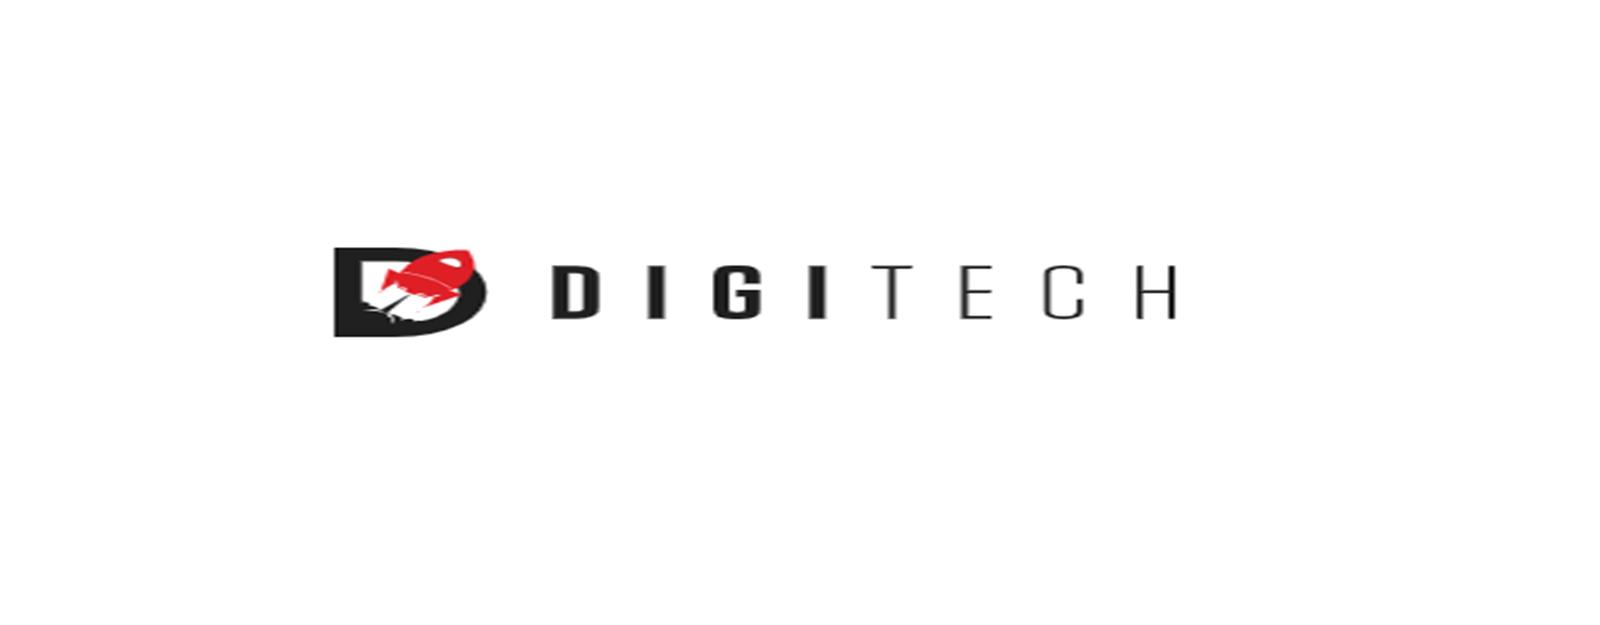 Digital Marketing Agency In Austin Tx Digitech Web Design In 2020 Digital Marketing Agency Marketing Agency Digital Marketing